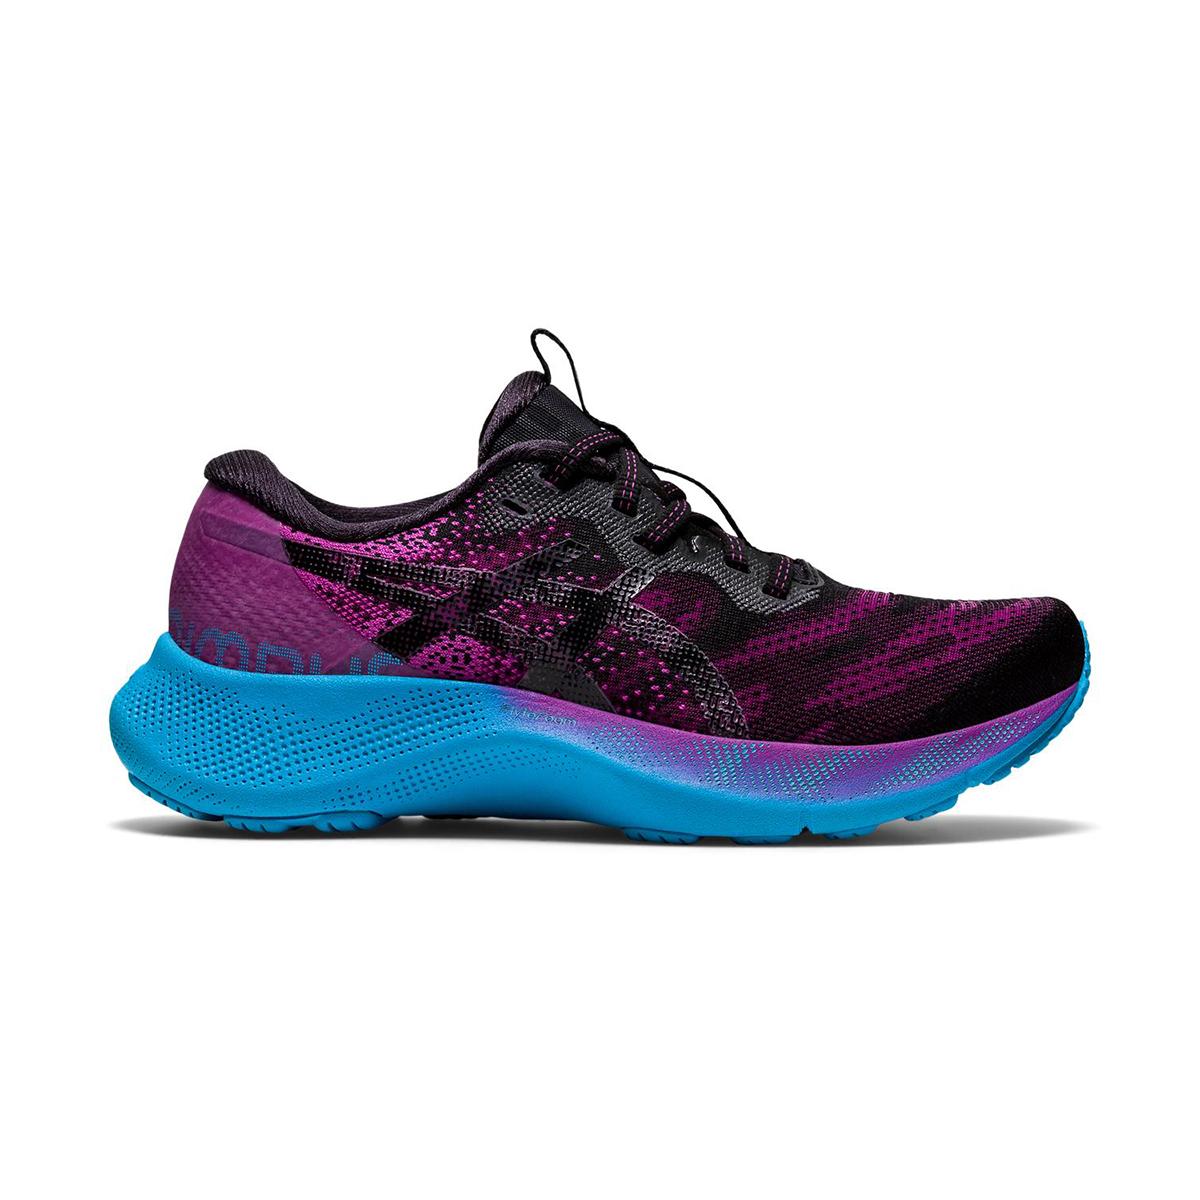 Women's Asics Gel-Nimbus Lite 2 Running Shoe - Color: Digital Grape/Black - Size: 5 - Width: Regular, Digital Grape/Black, large, image 1